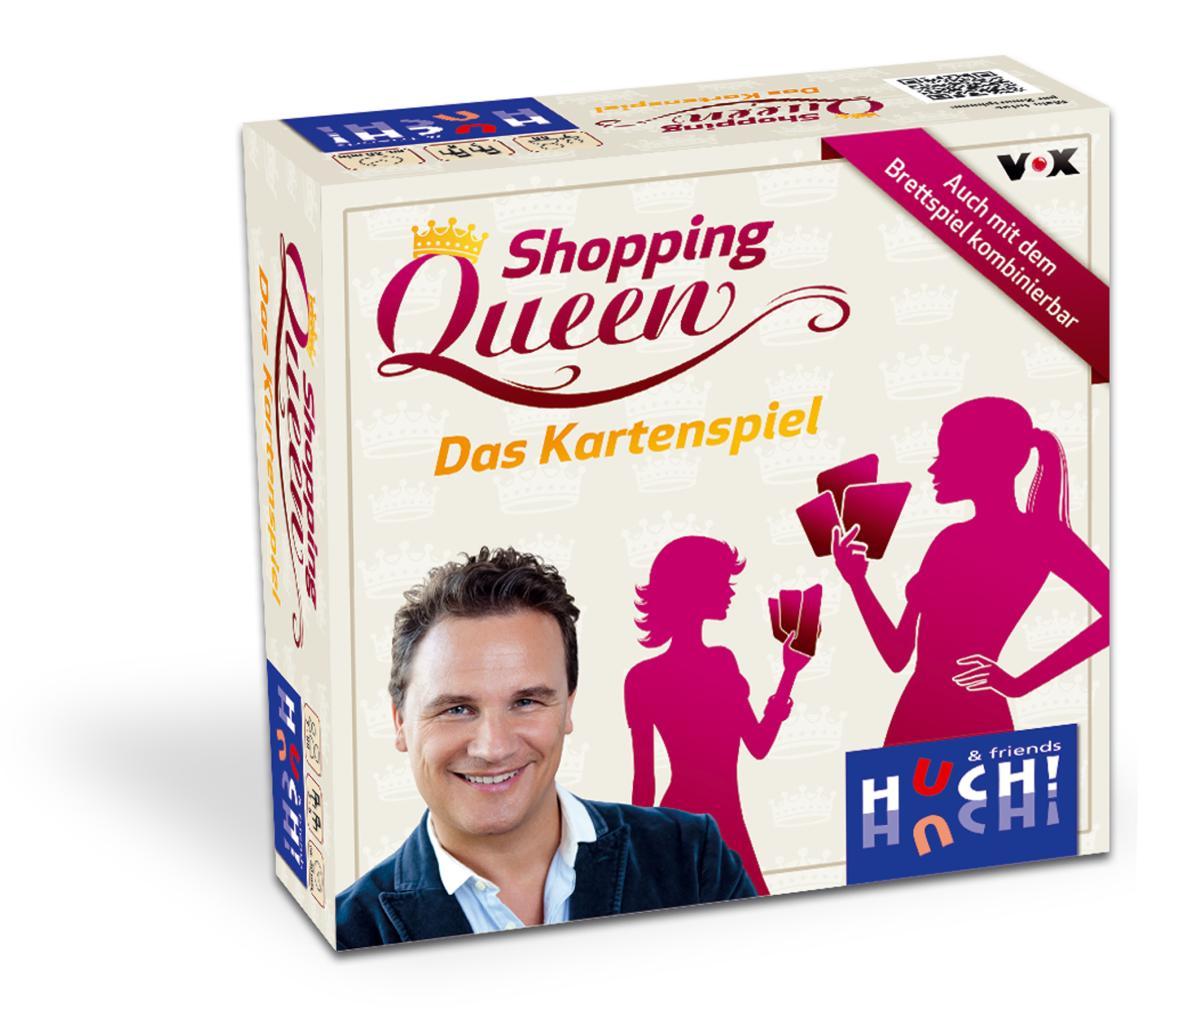 shopping queen kartenspiel g nstig online kaufen. Black Bedroom Furniture Sets. Home Design Ideas